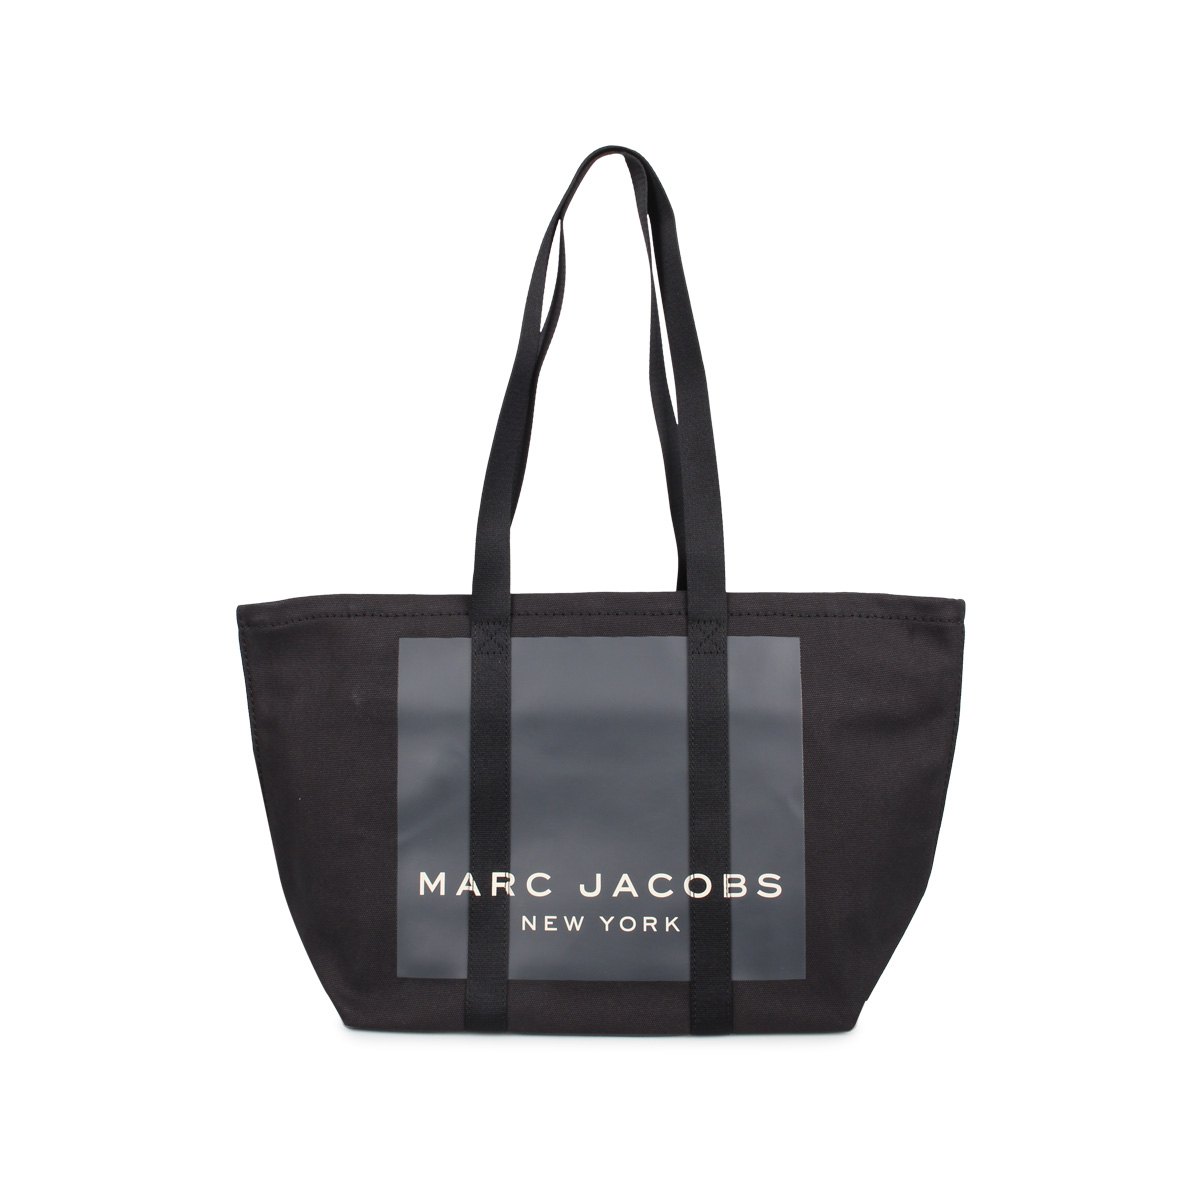 MARC JACOBS KAMALA TOTE BAG マークジェイコブス バッグ トートバッグ レディース ブラック 黒 M0015375-001 [3/10 新入荷]